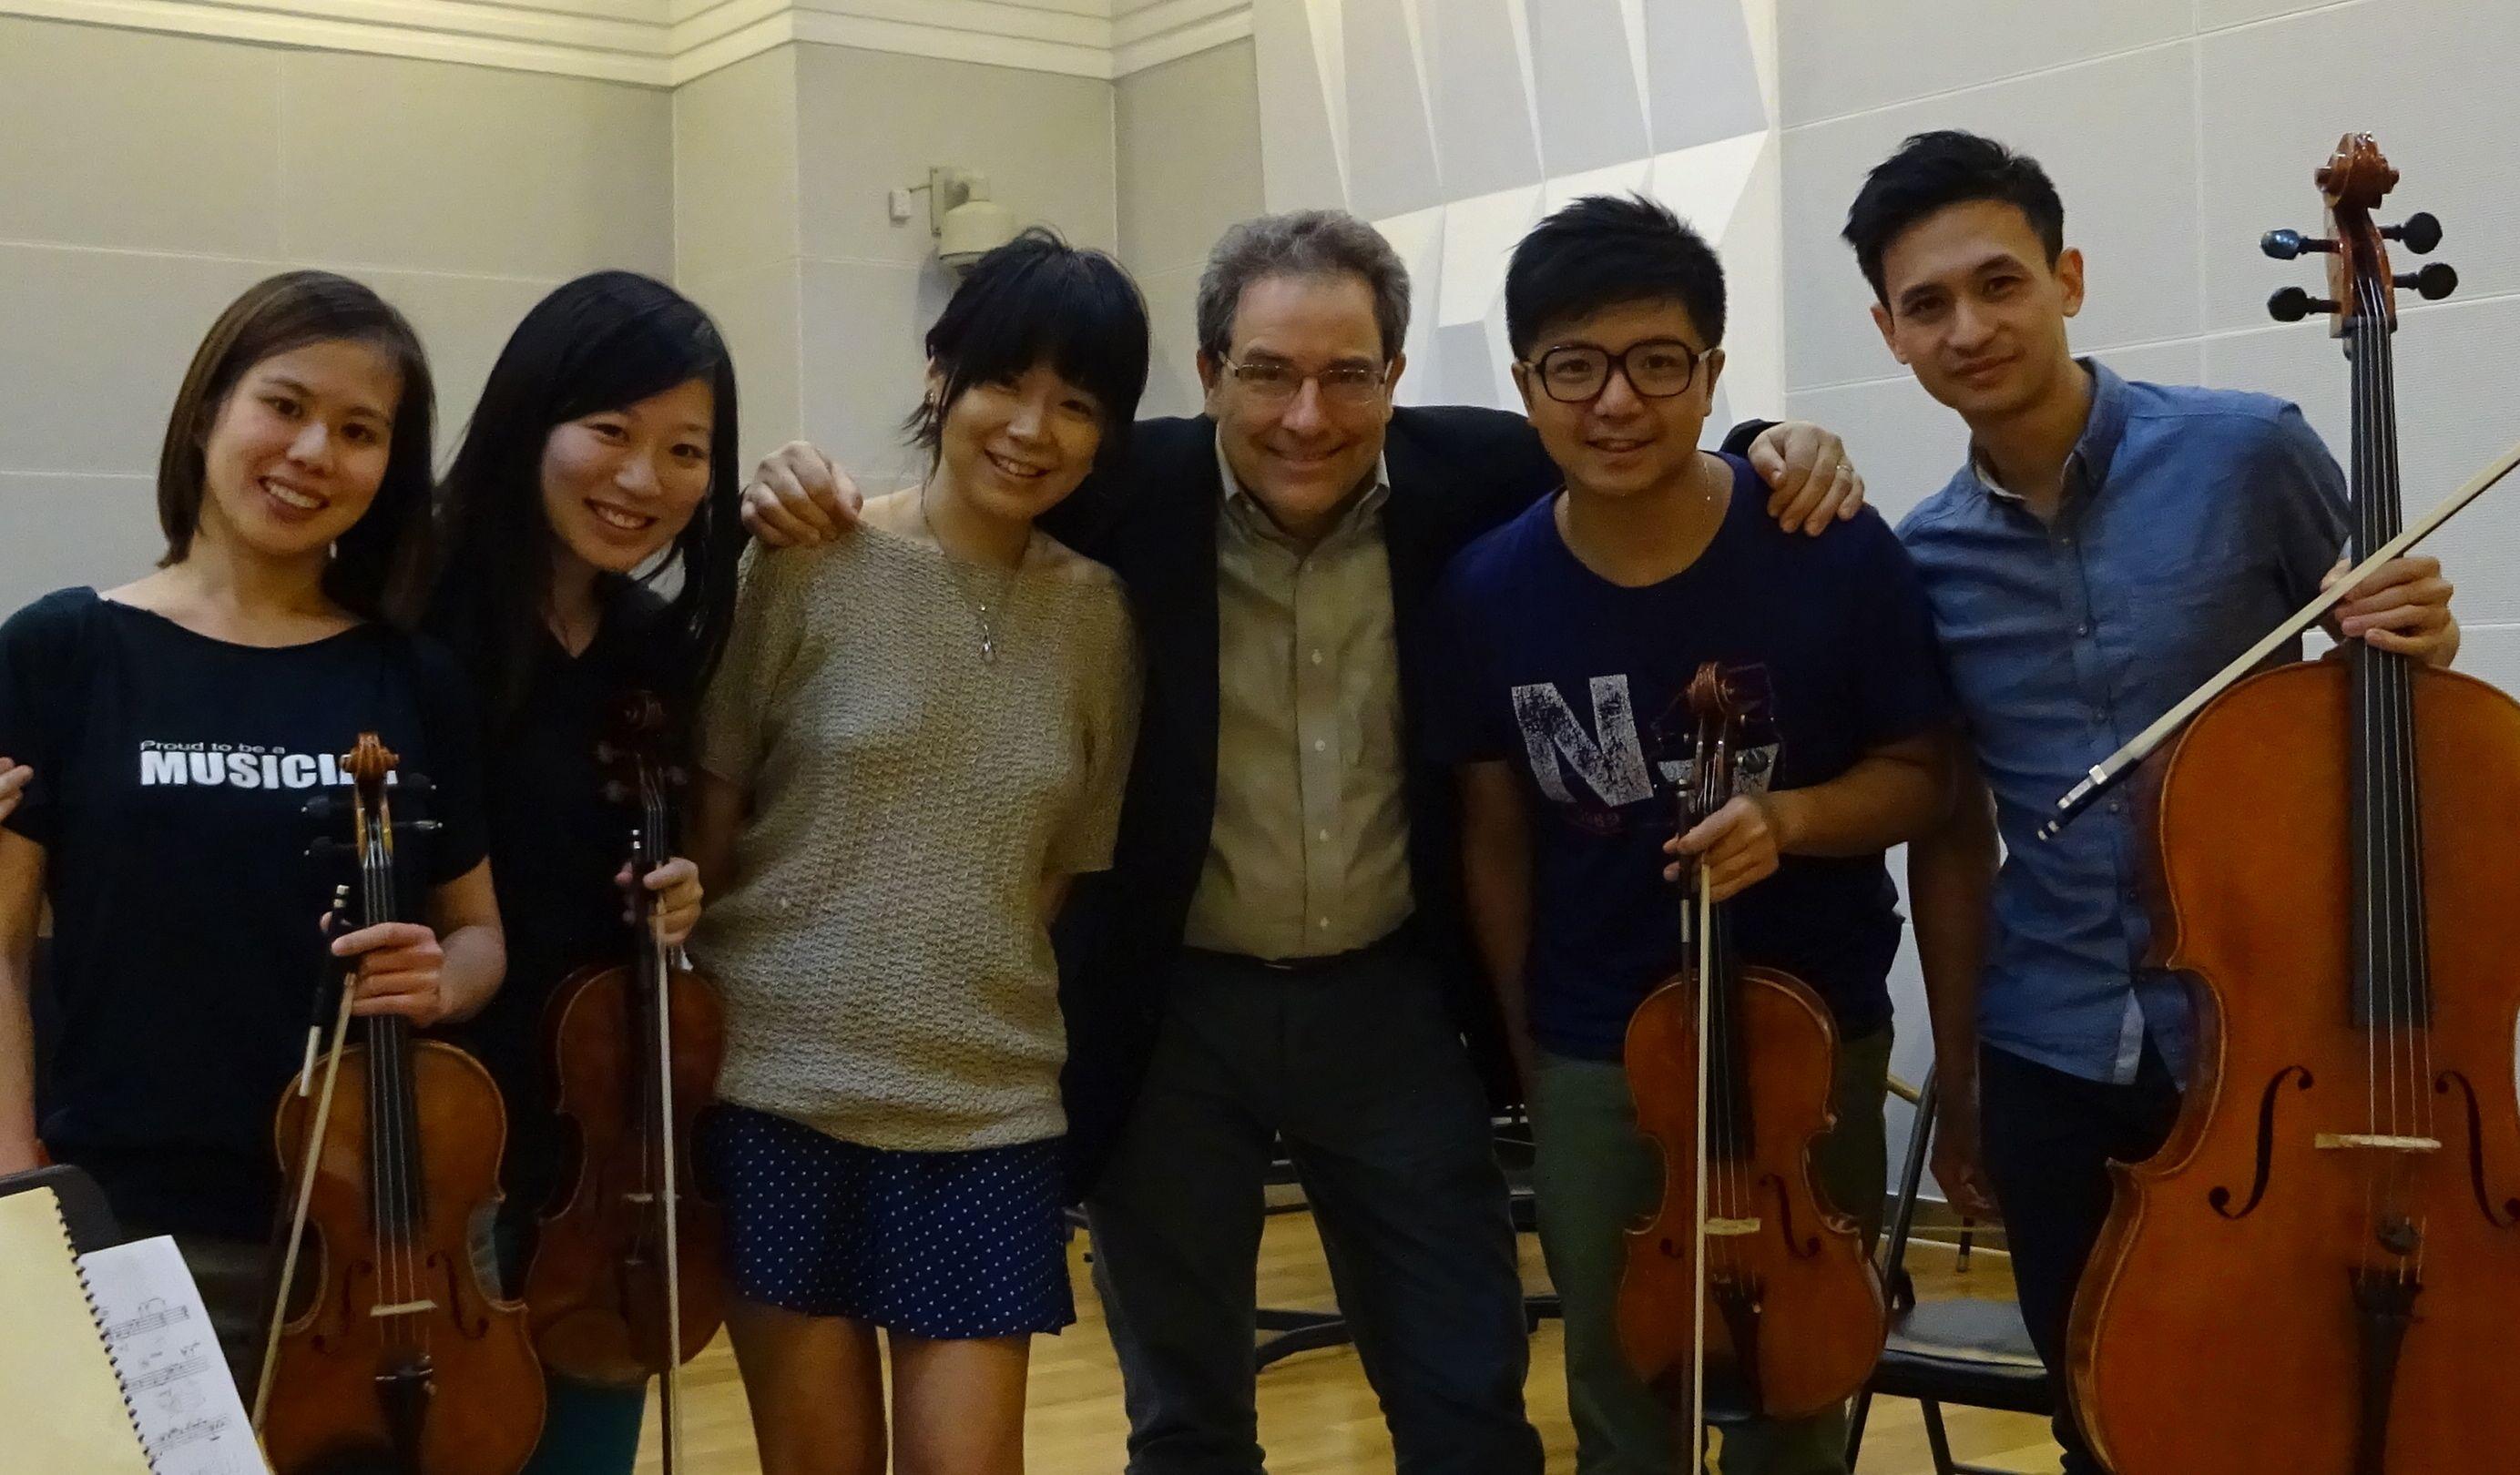 Dr. Edward Smaldone & Hsin-lei Chen